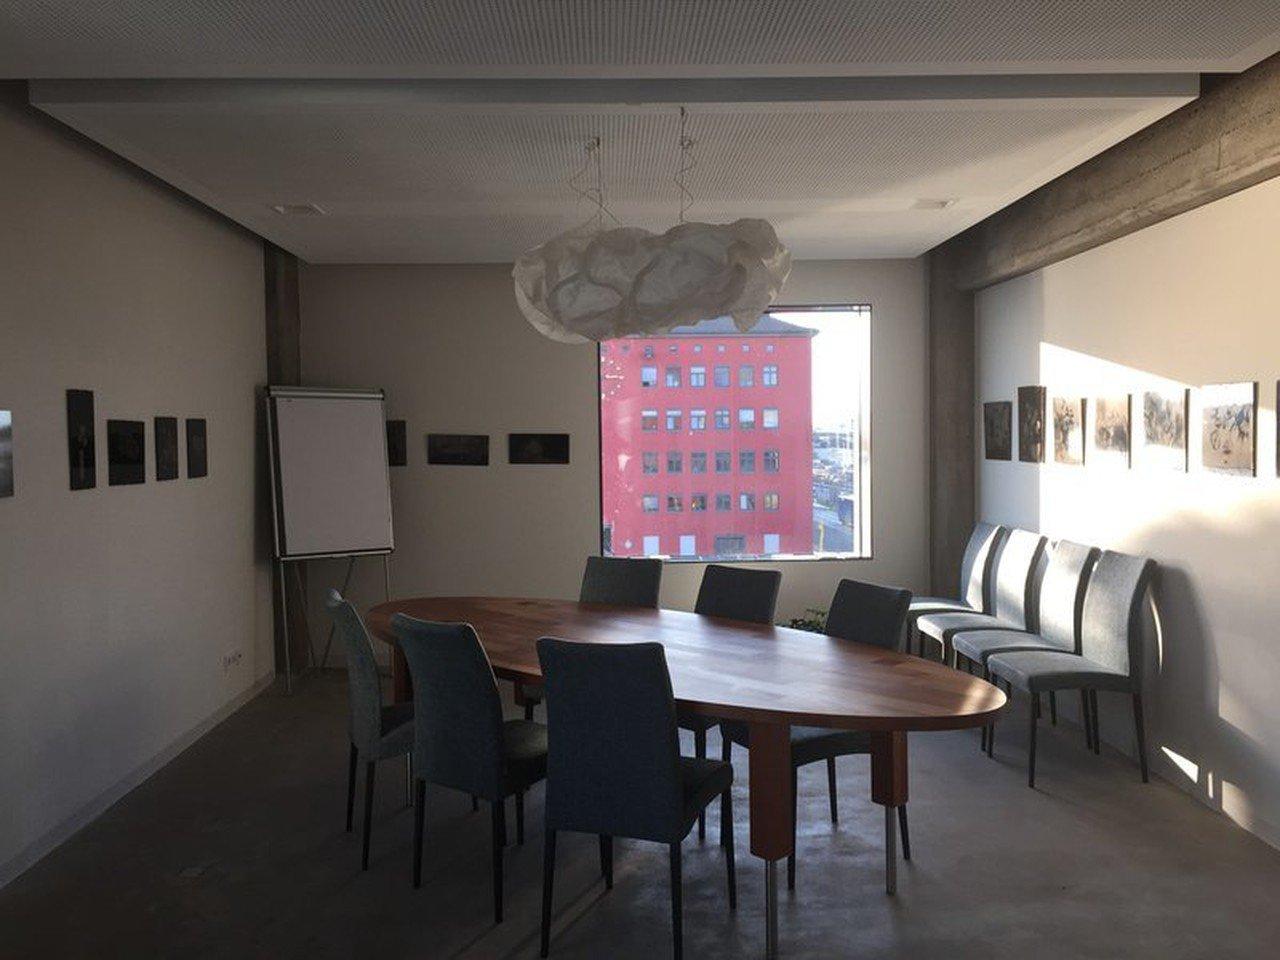 Mannheim seminar rooms Meetingraum Clubspreicher7 Rhein image 0